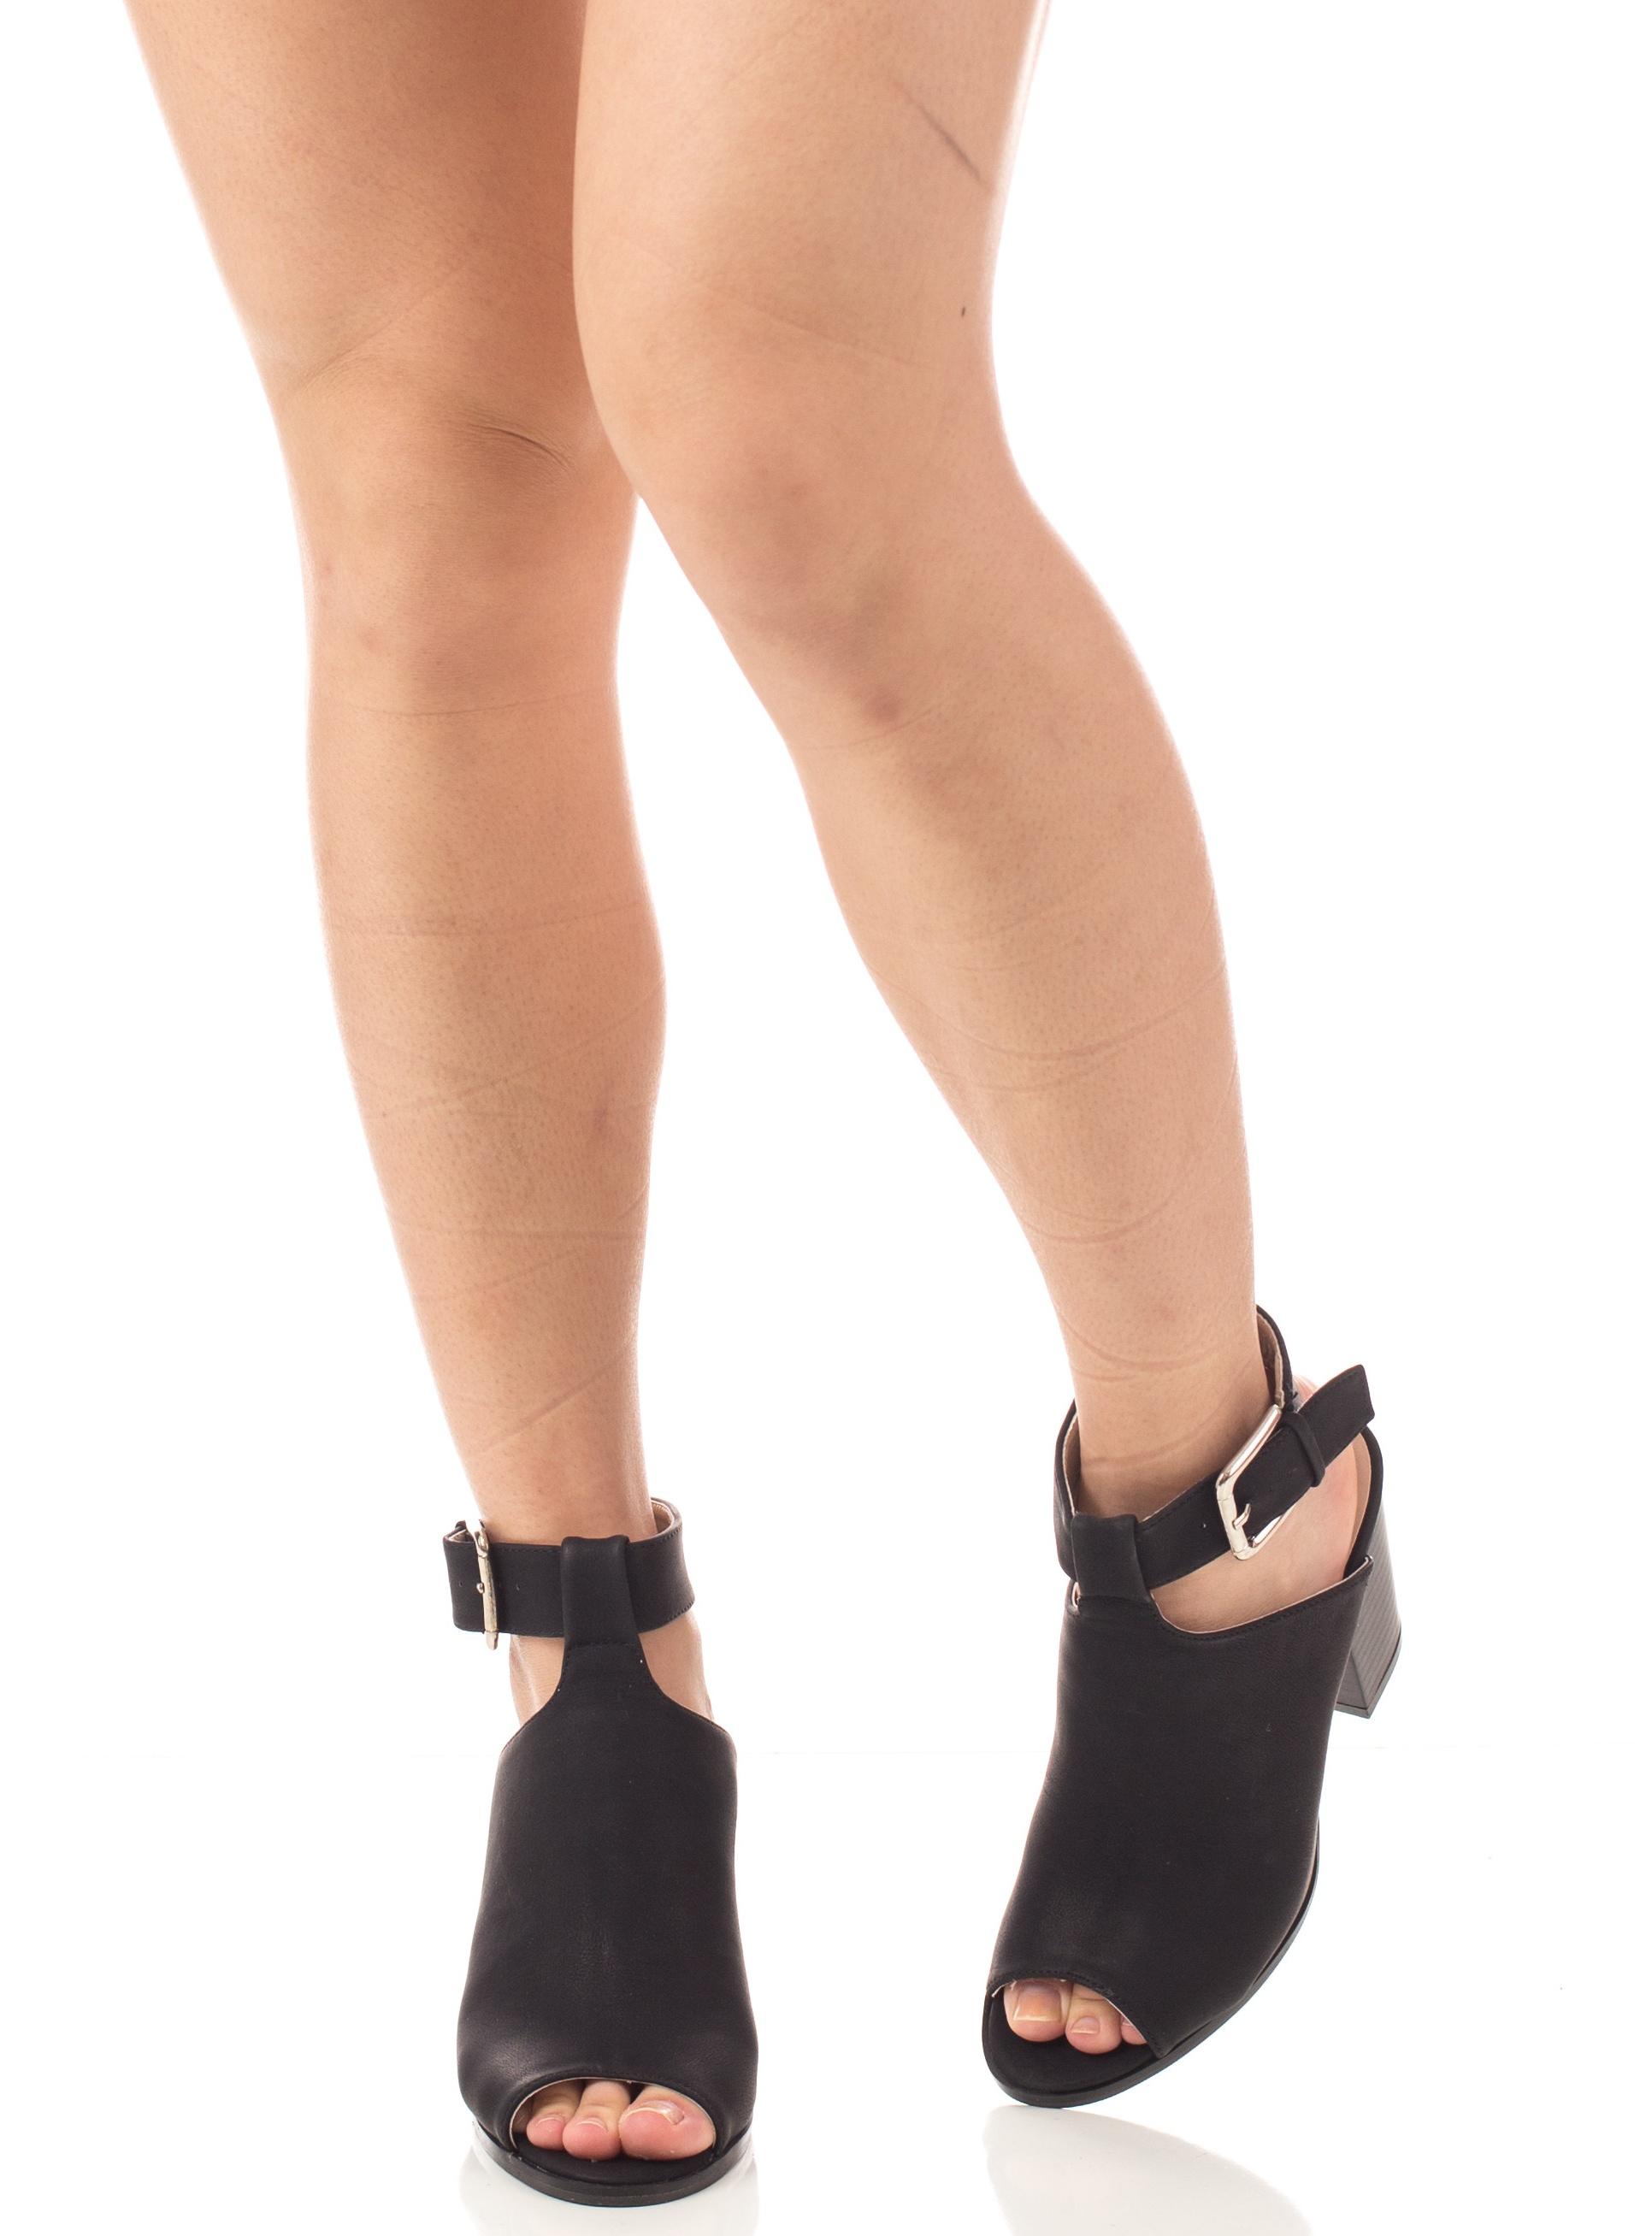 Soho Shoes Women's Open toe Chunky Heel Ankle Booties